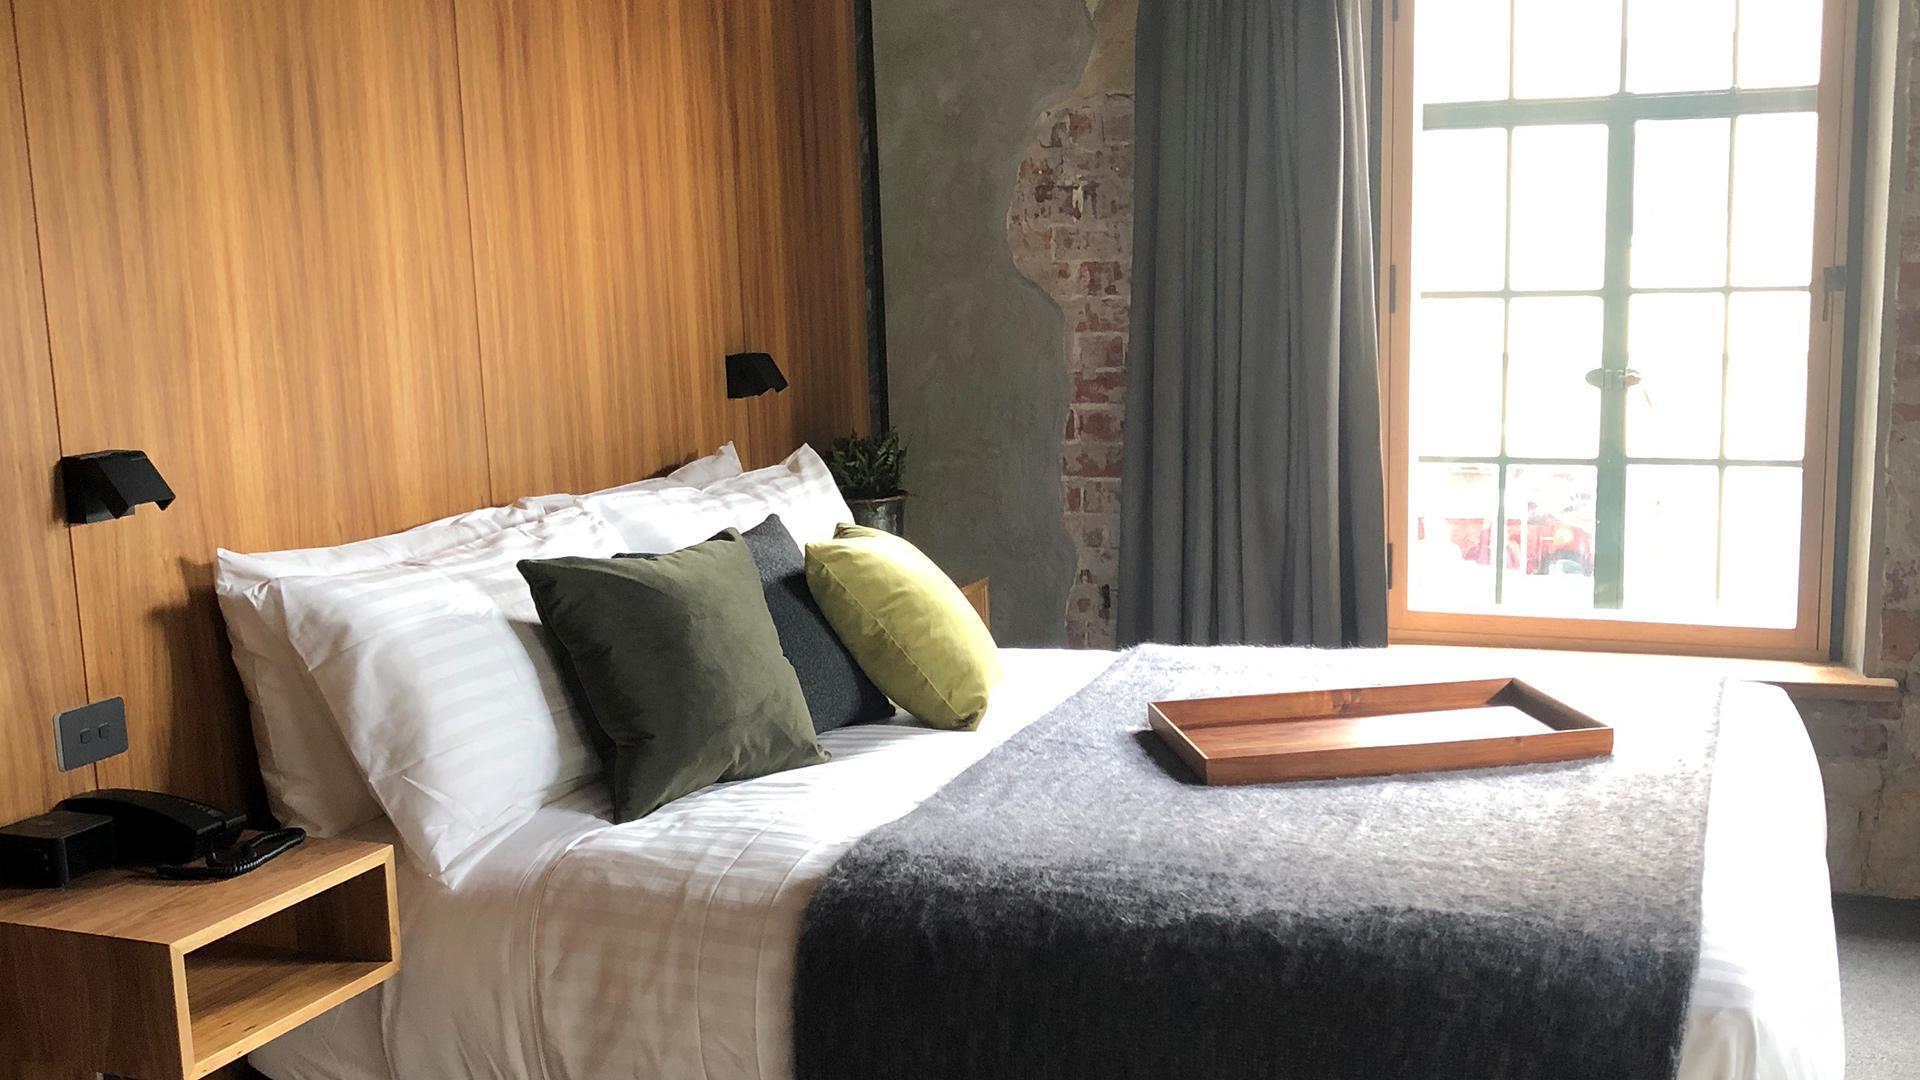 Bower Room - Feb 20 image 1 at Moss Hotel by Hobart City Council, Tasmania, Australia